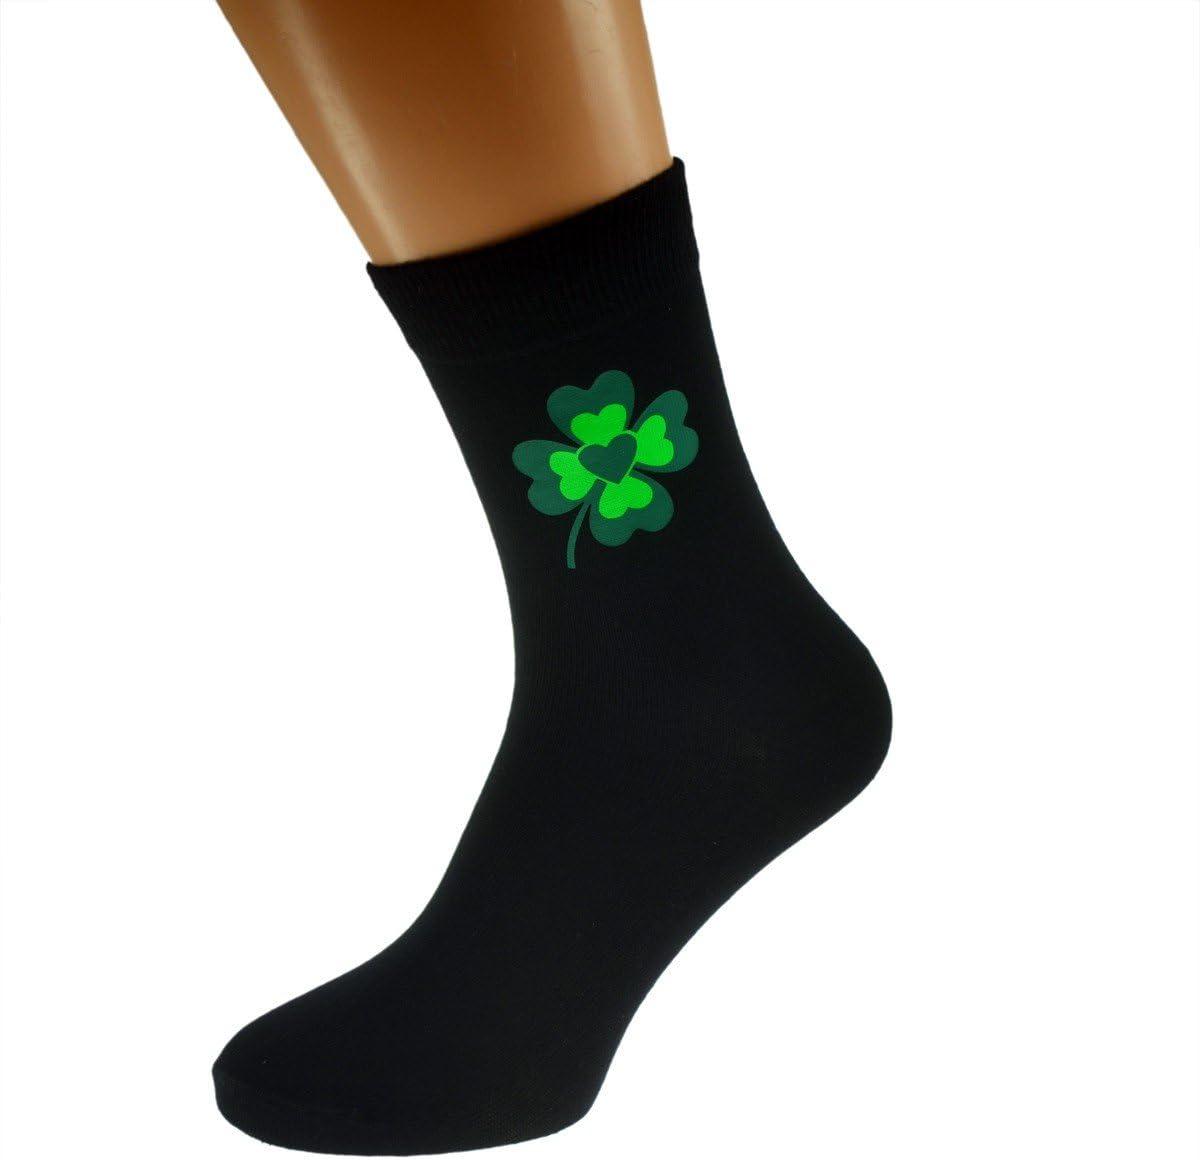 GTR-Prestige Giftware Lucky 4 Leaf Clover Heart Centre Mens Black Socks Adult size UK 6-12 Euro 39-46 X6N438